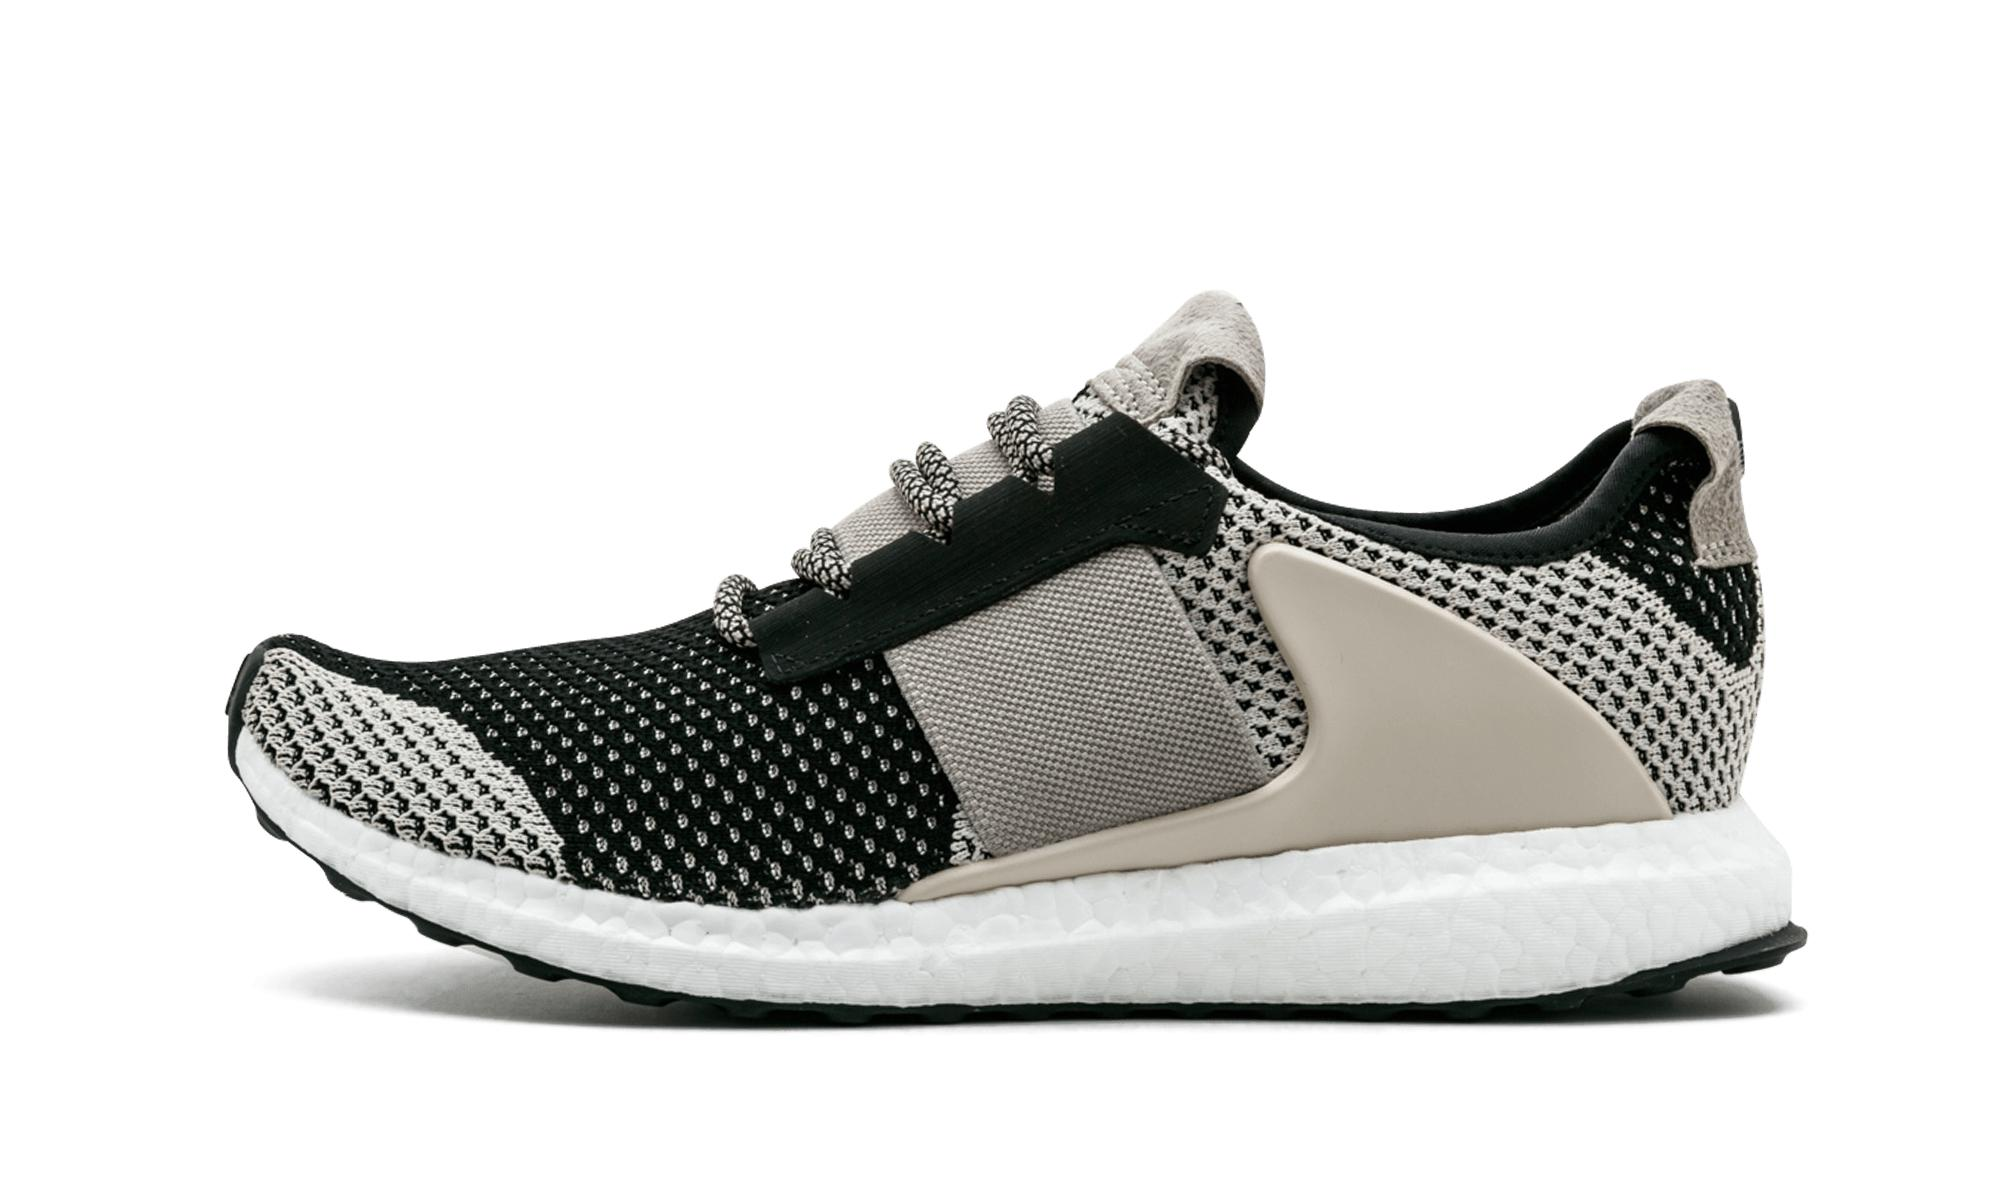 3c908ee65 Lyst - adidas Ado Ultraboost in Black for Men - Save 33.89830508474576%